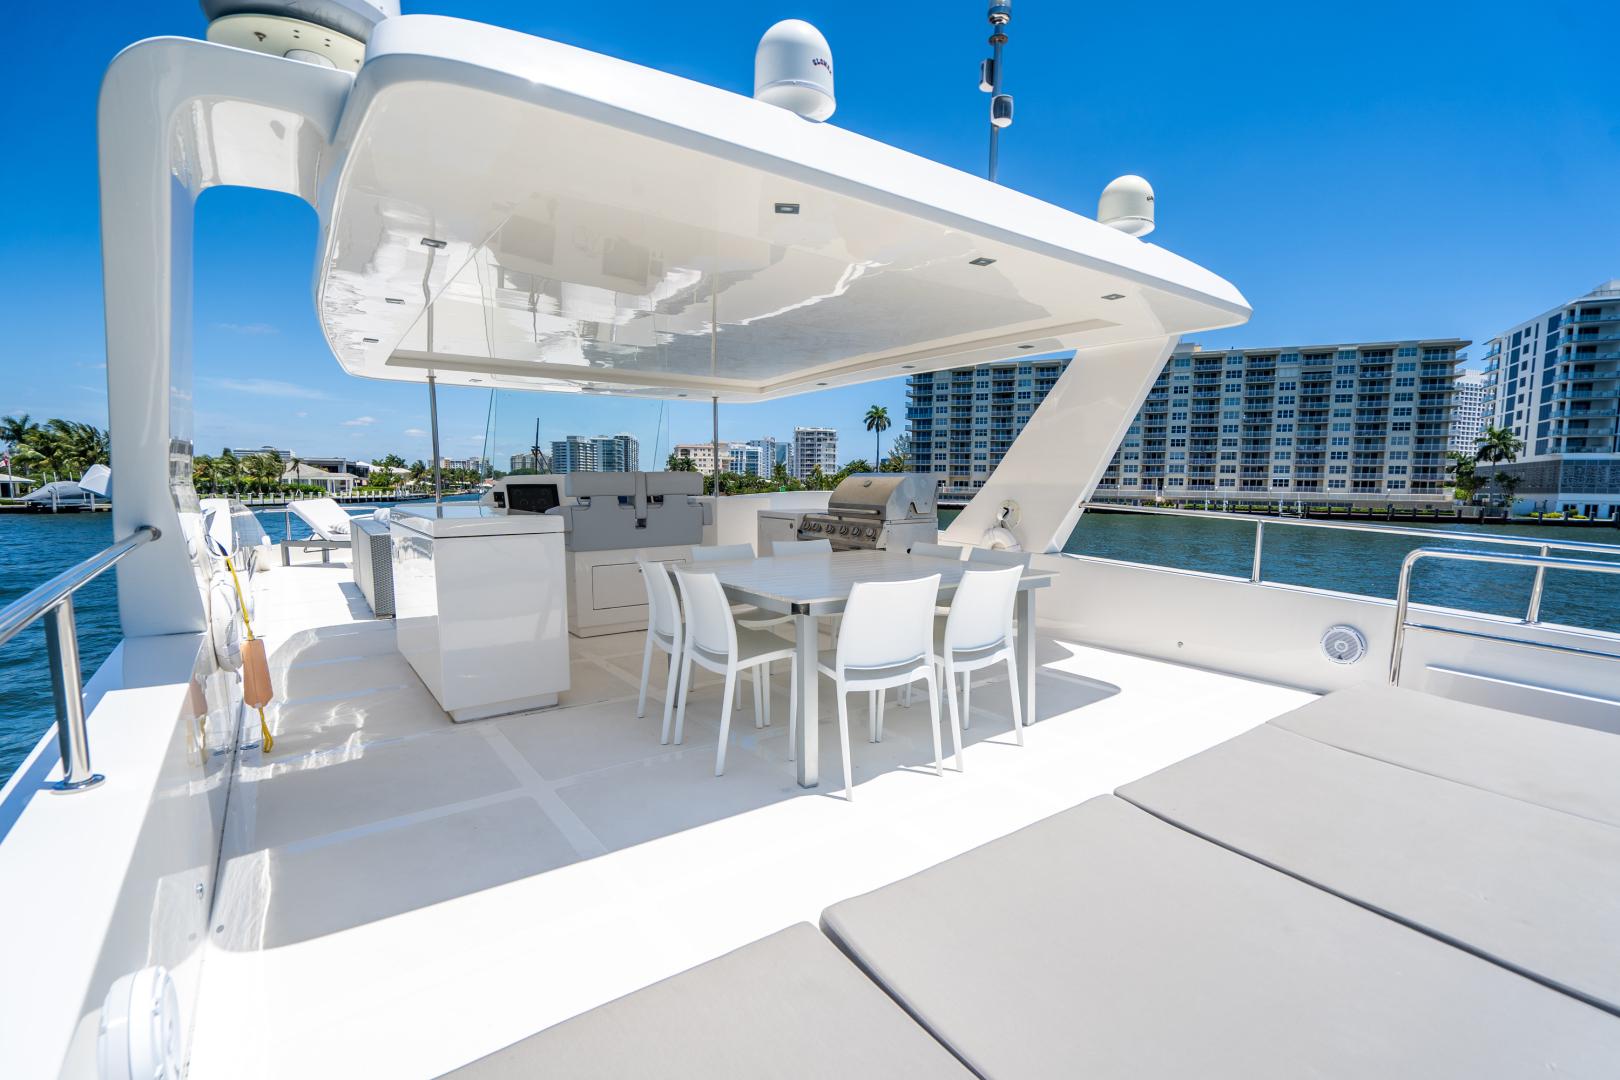 Overblue-58 Power Catamaran 2017-Techuila Ft. Lauderdale-Florida-United States-2017 Overblue 58 Powercat-1401182   Thumbnail